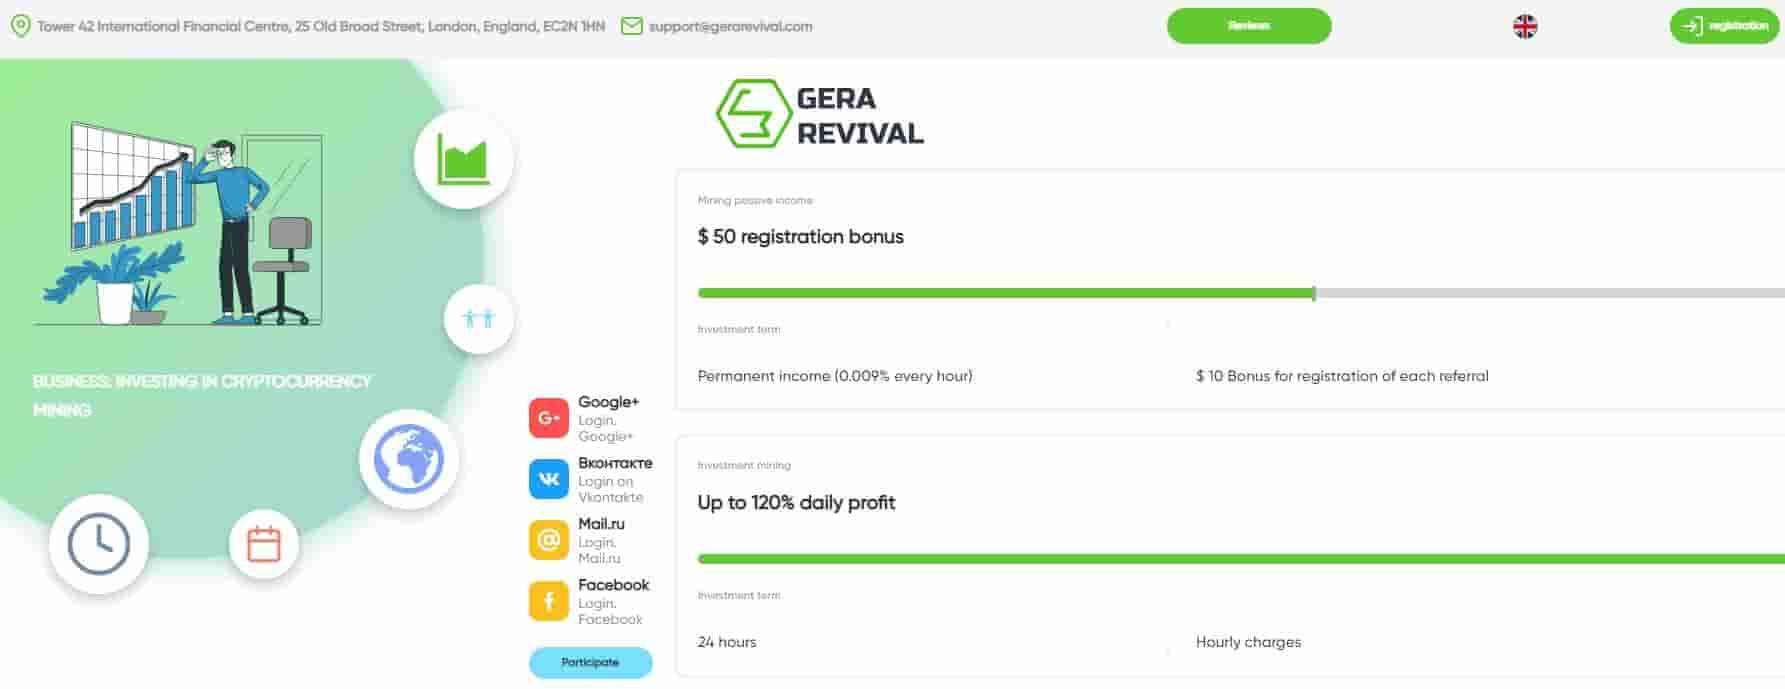 Gera Revival